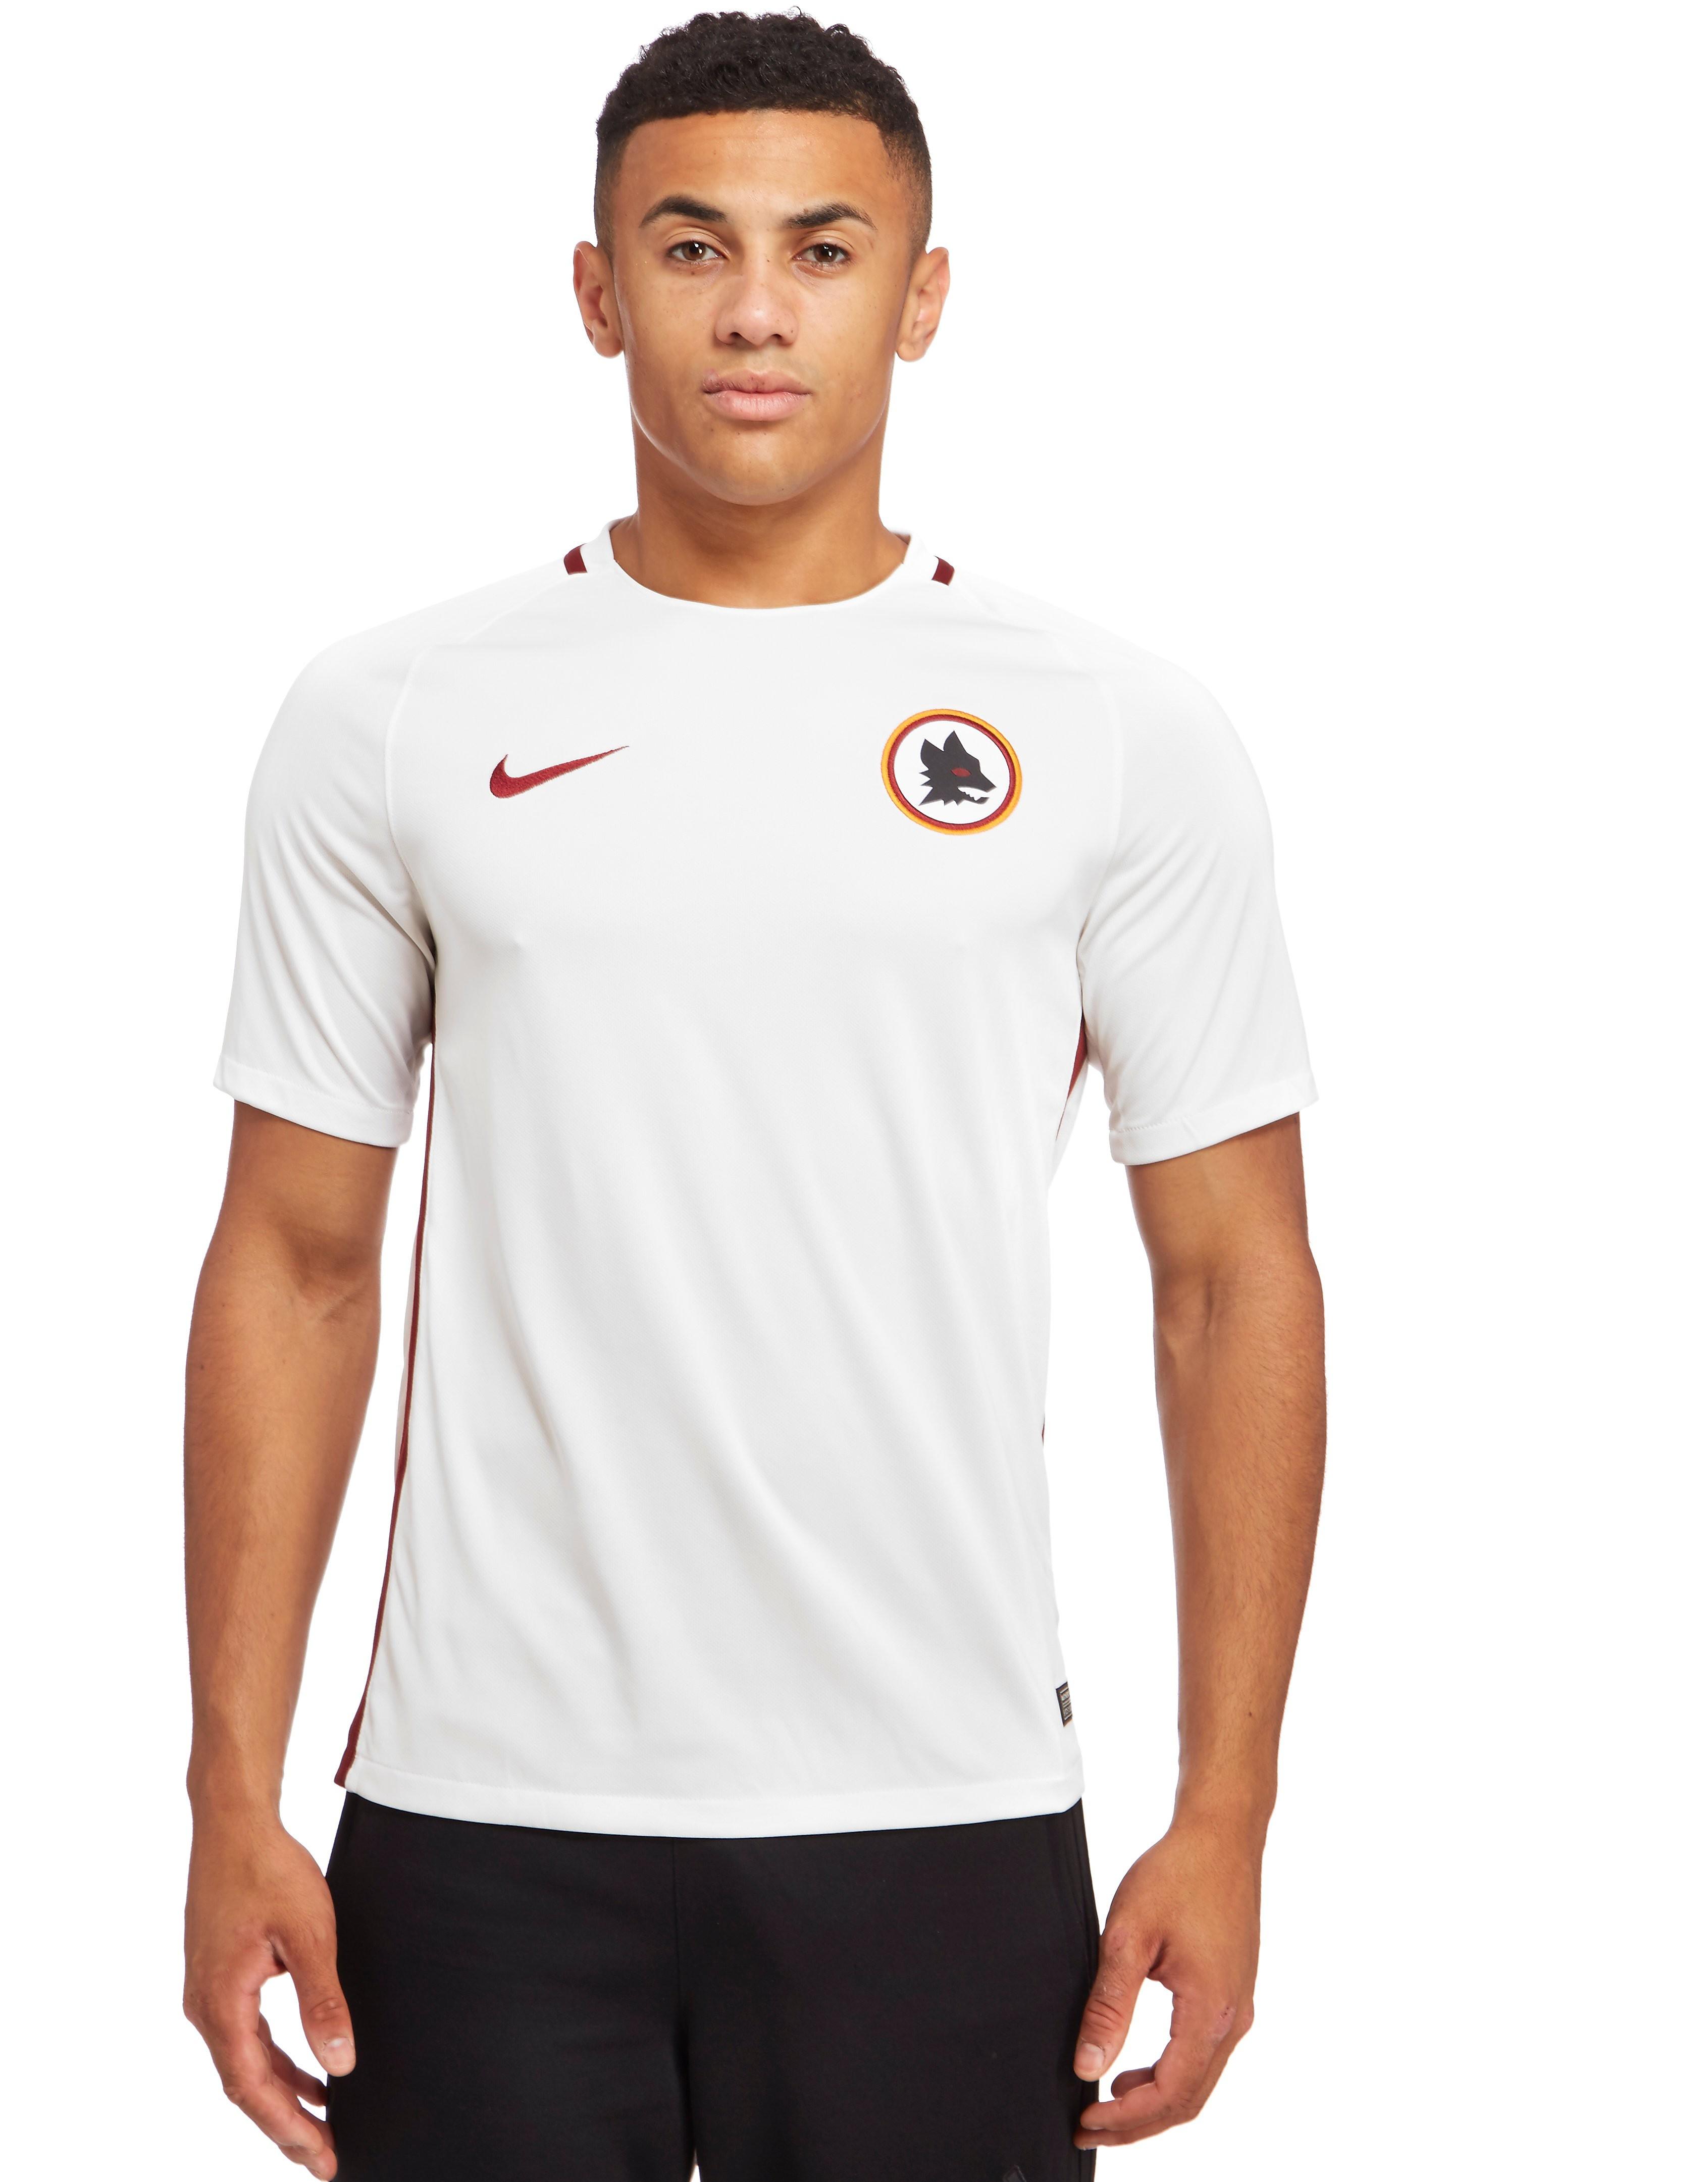 Nike Roma 2016/17 Away Shirt